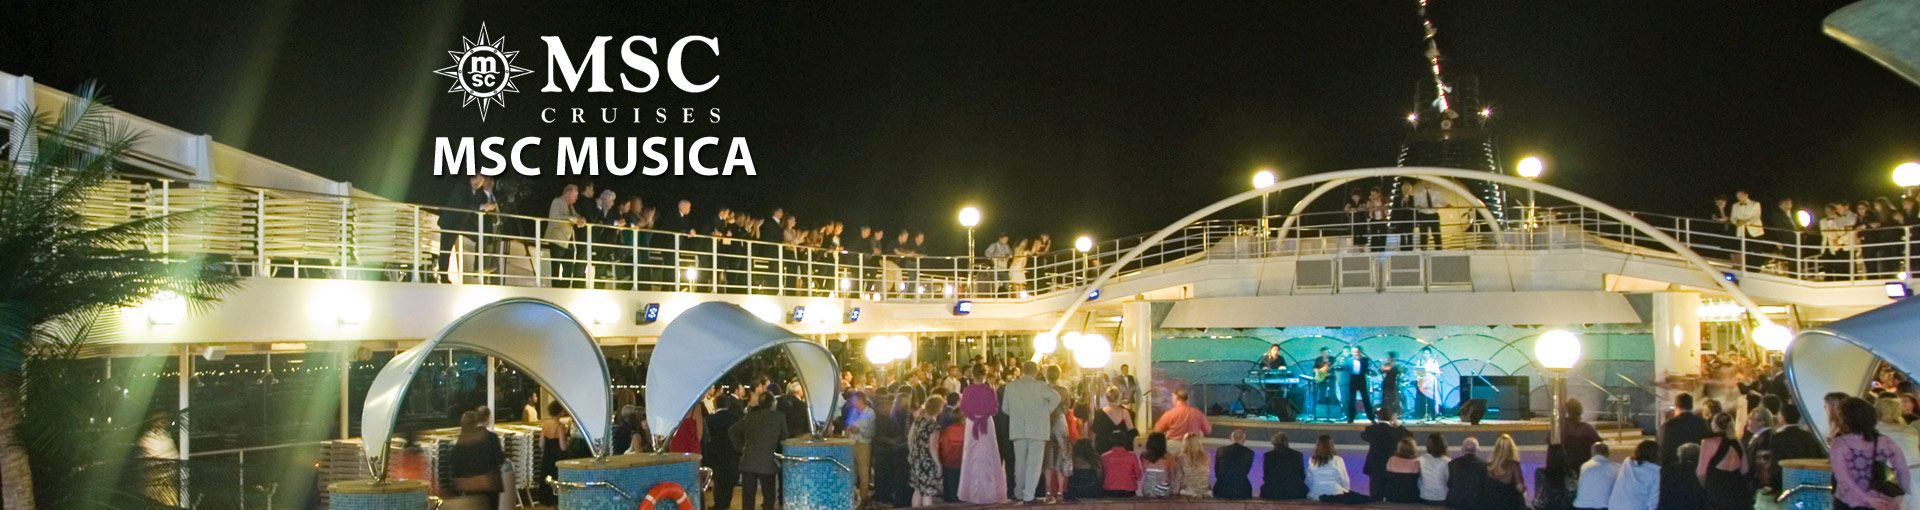 MSC Cruises MSC Musica cruise ship